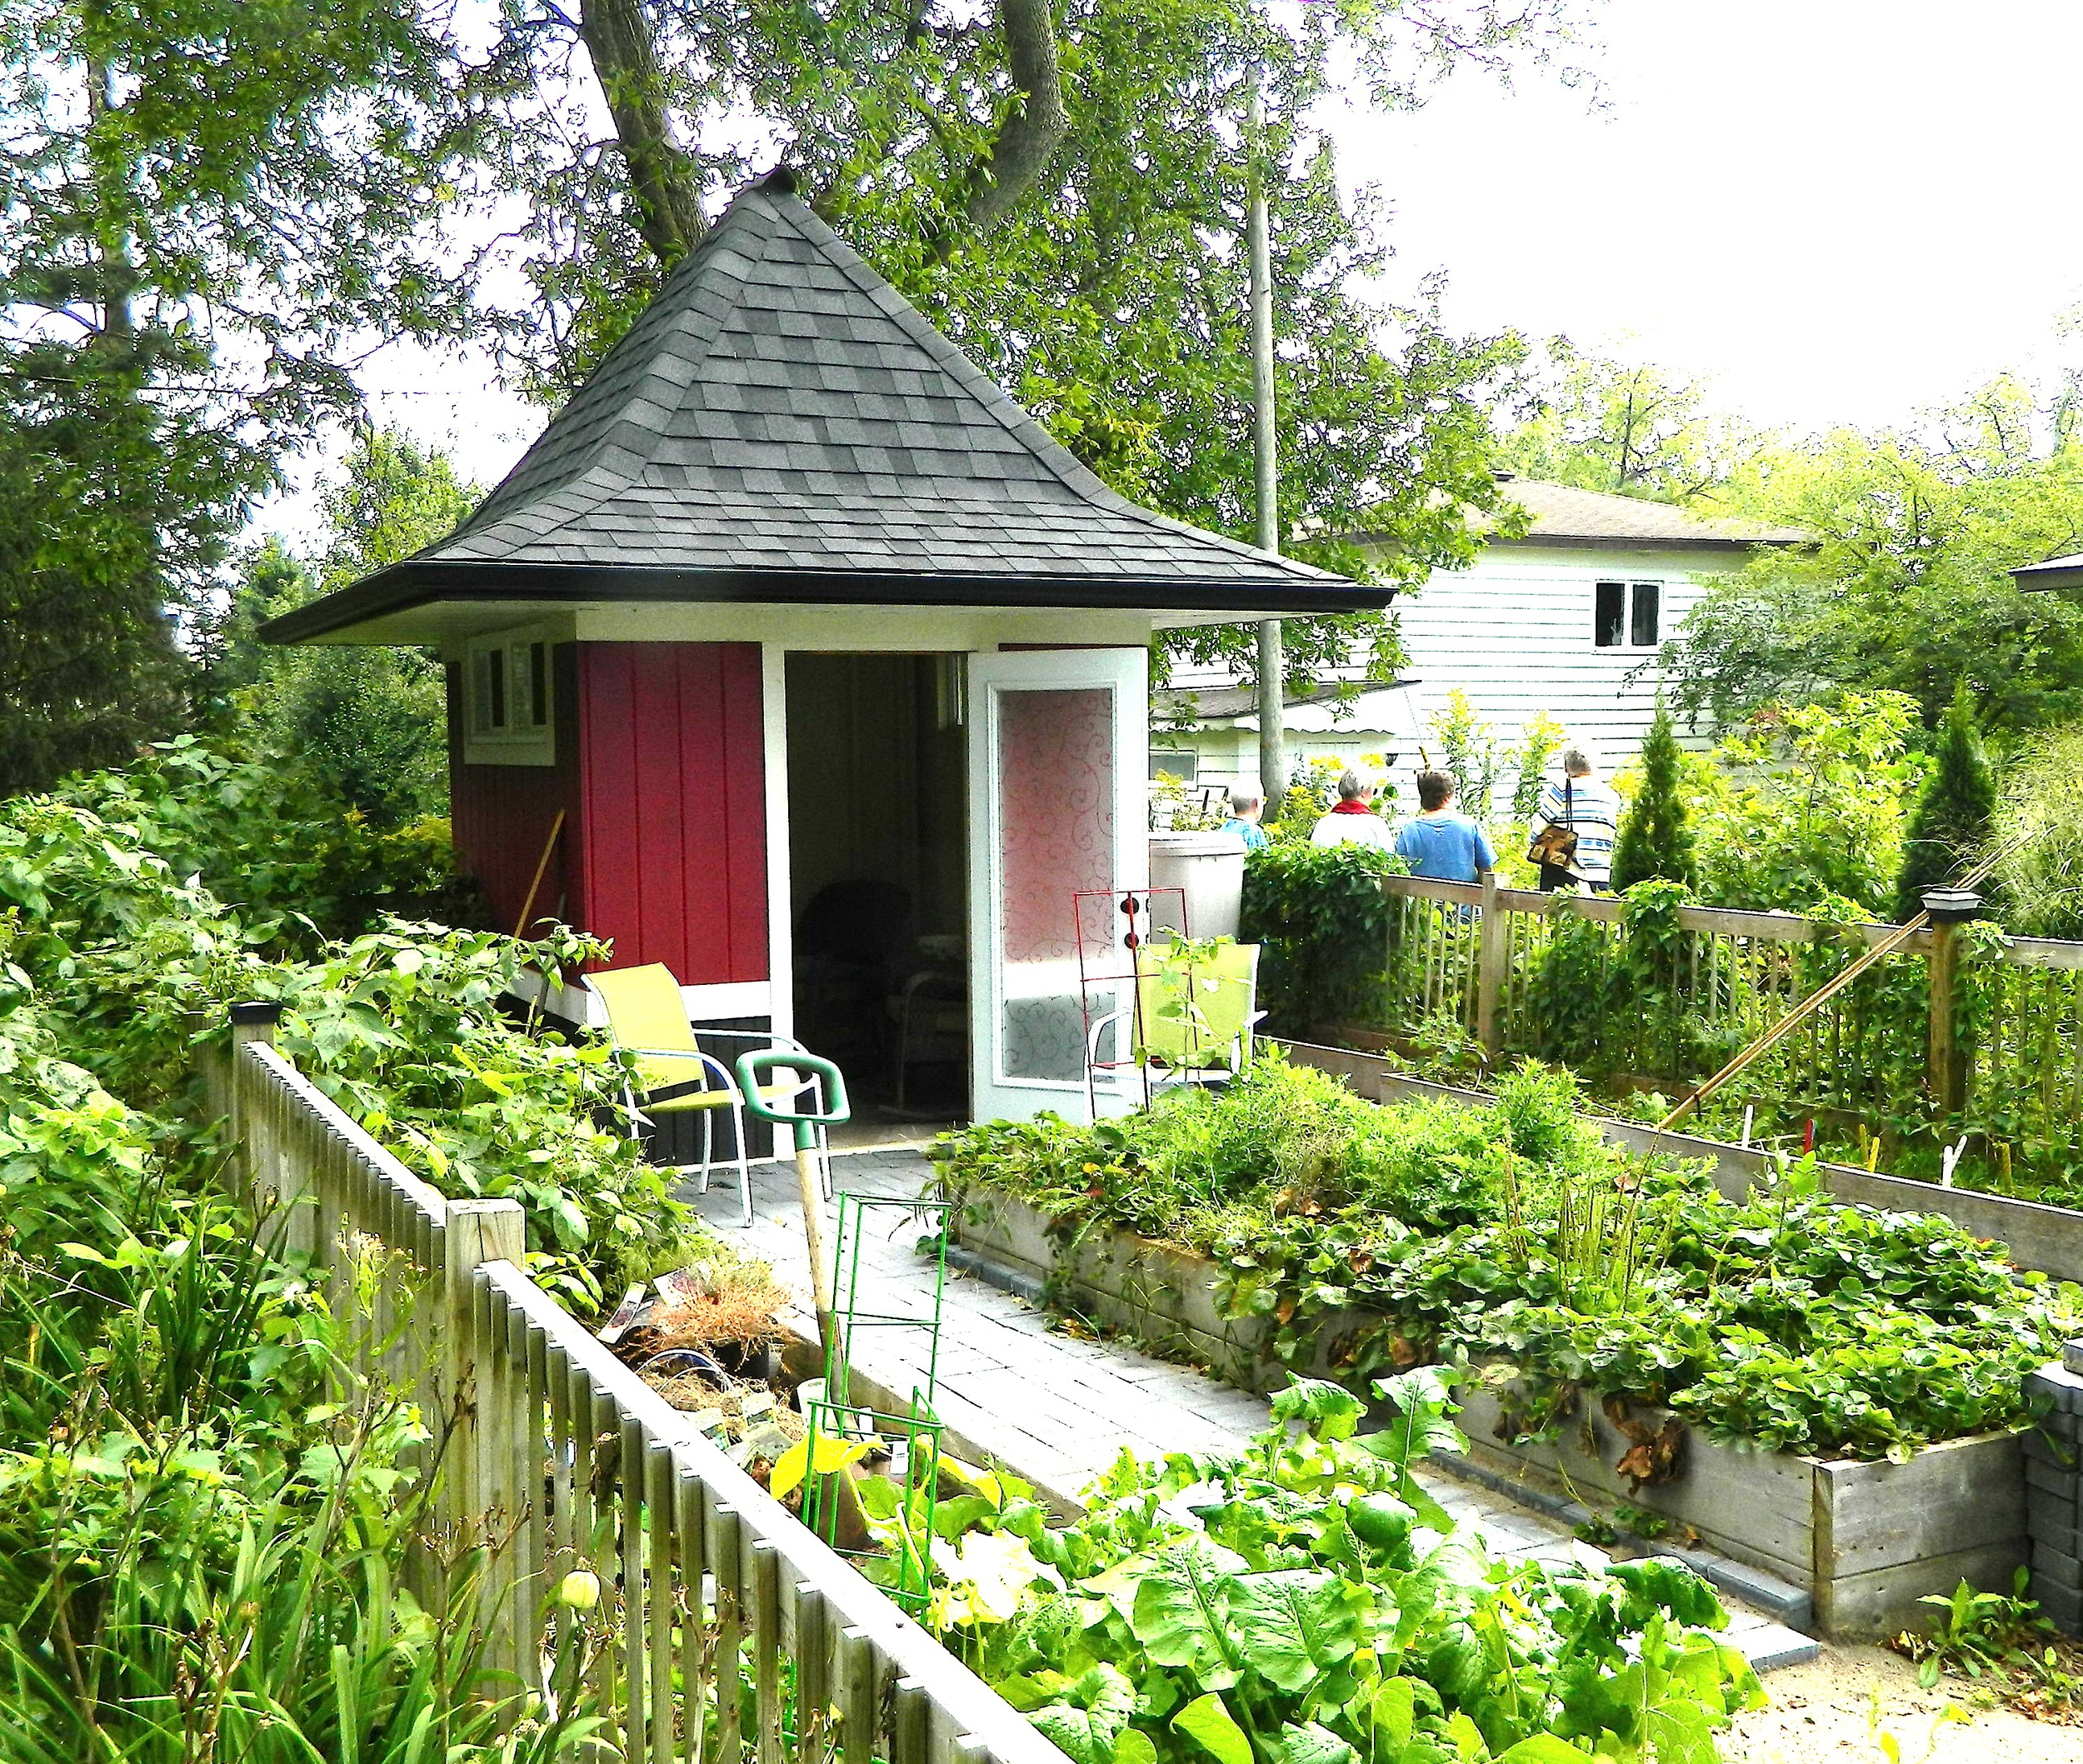 Flynn's garden shed 9.14-1.JPG